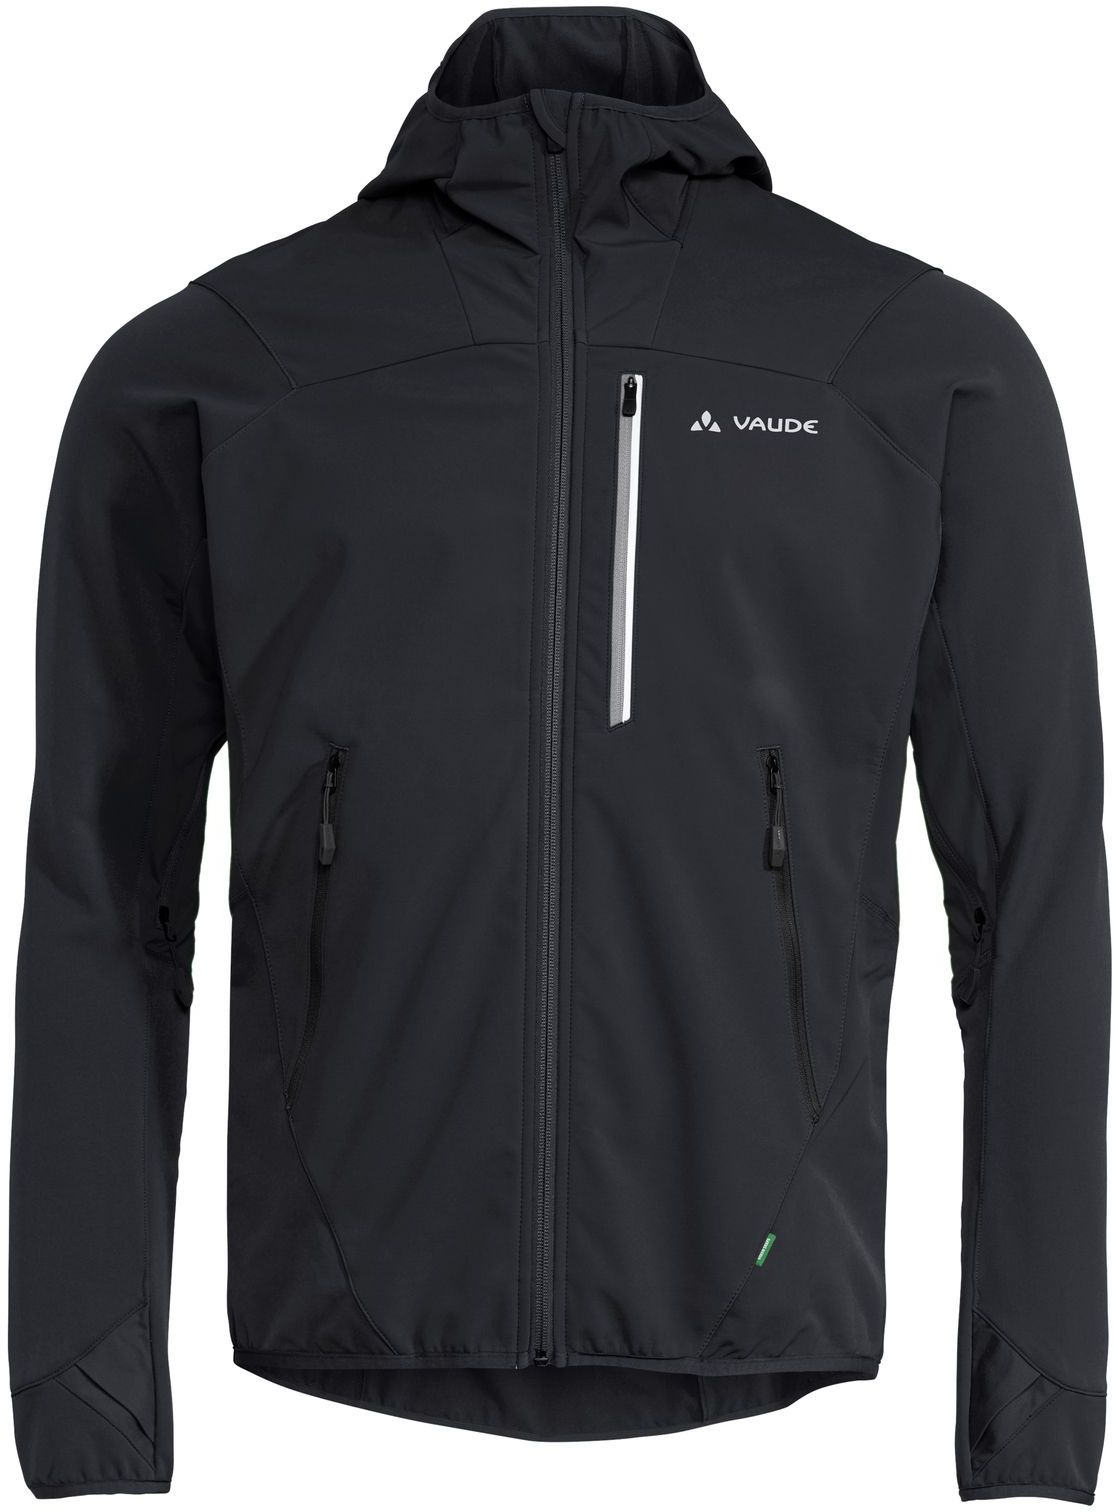 Vaude Men's Larice Jacket IV - black M